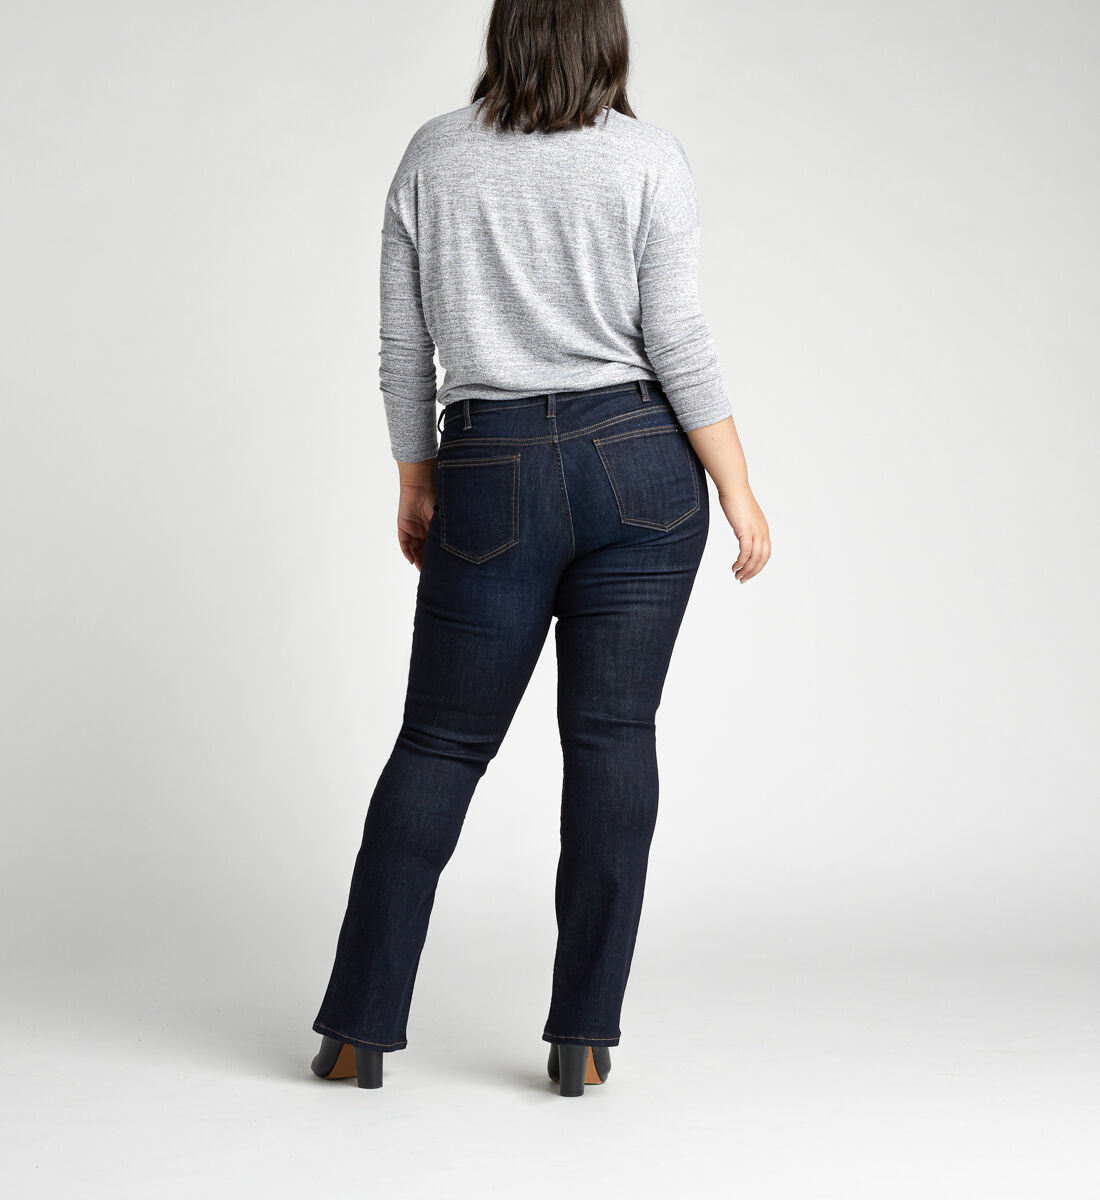 Elyse Mid Rise Slim Bootcut Plus Size Jeans Back